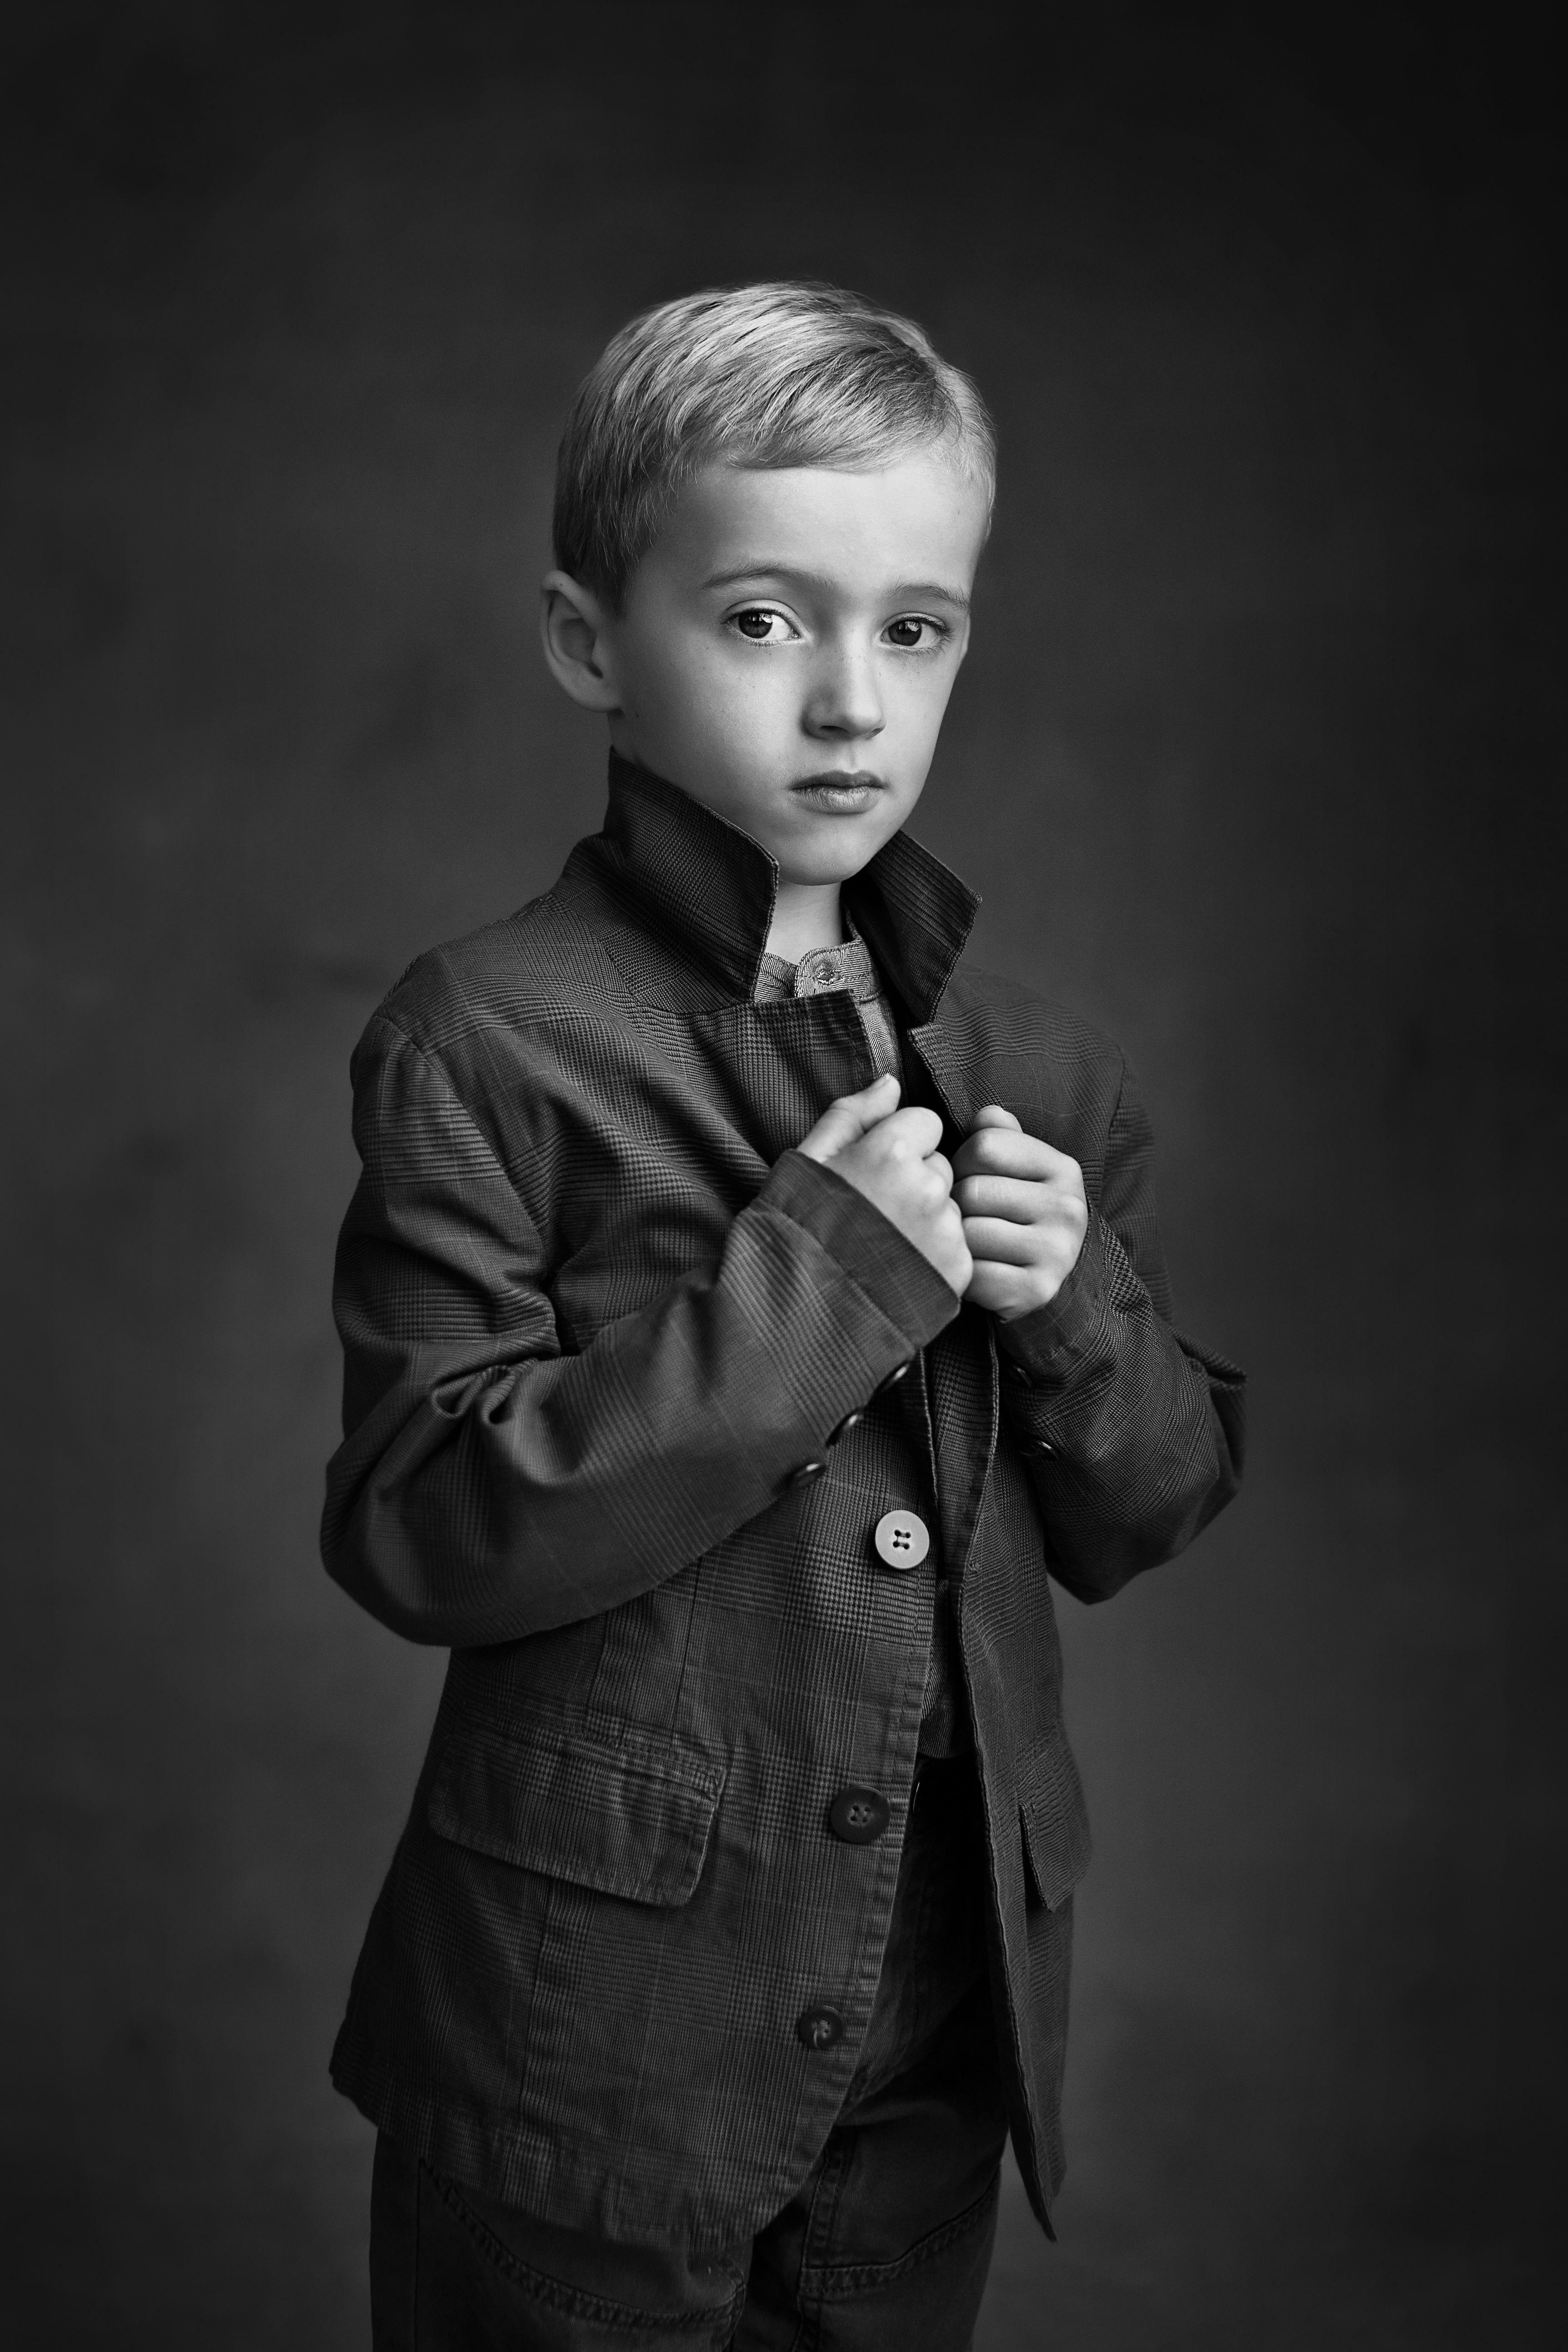 Awesome photo bandwportraitphotographyart kids